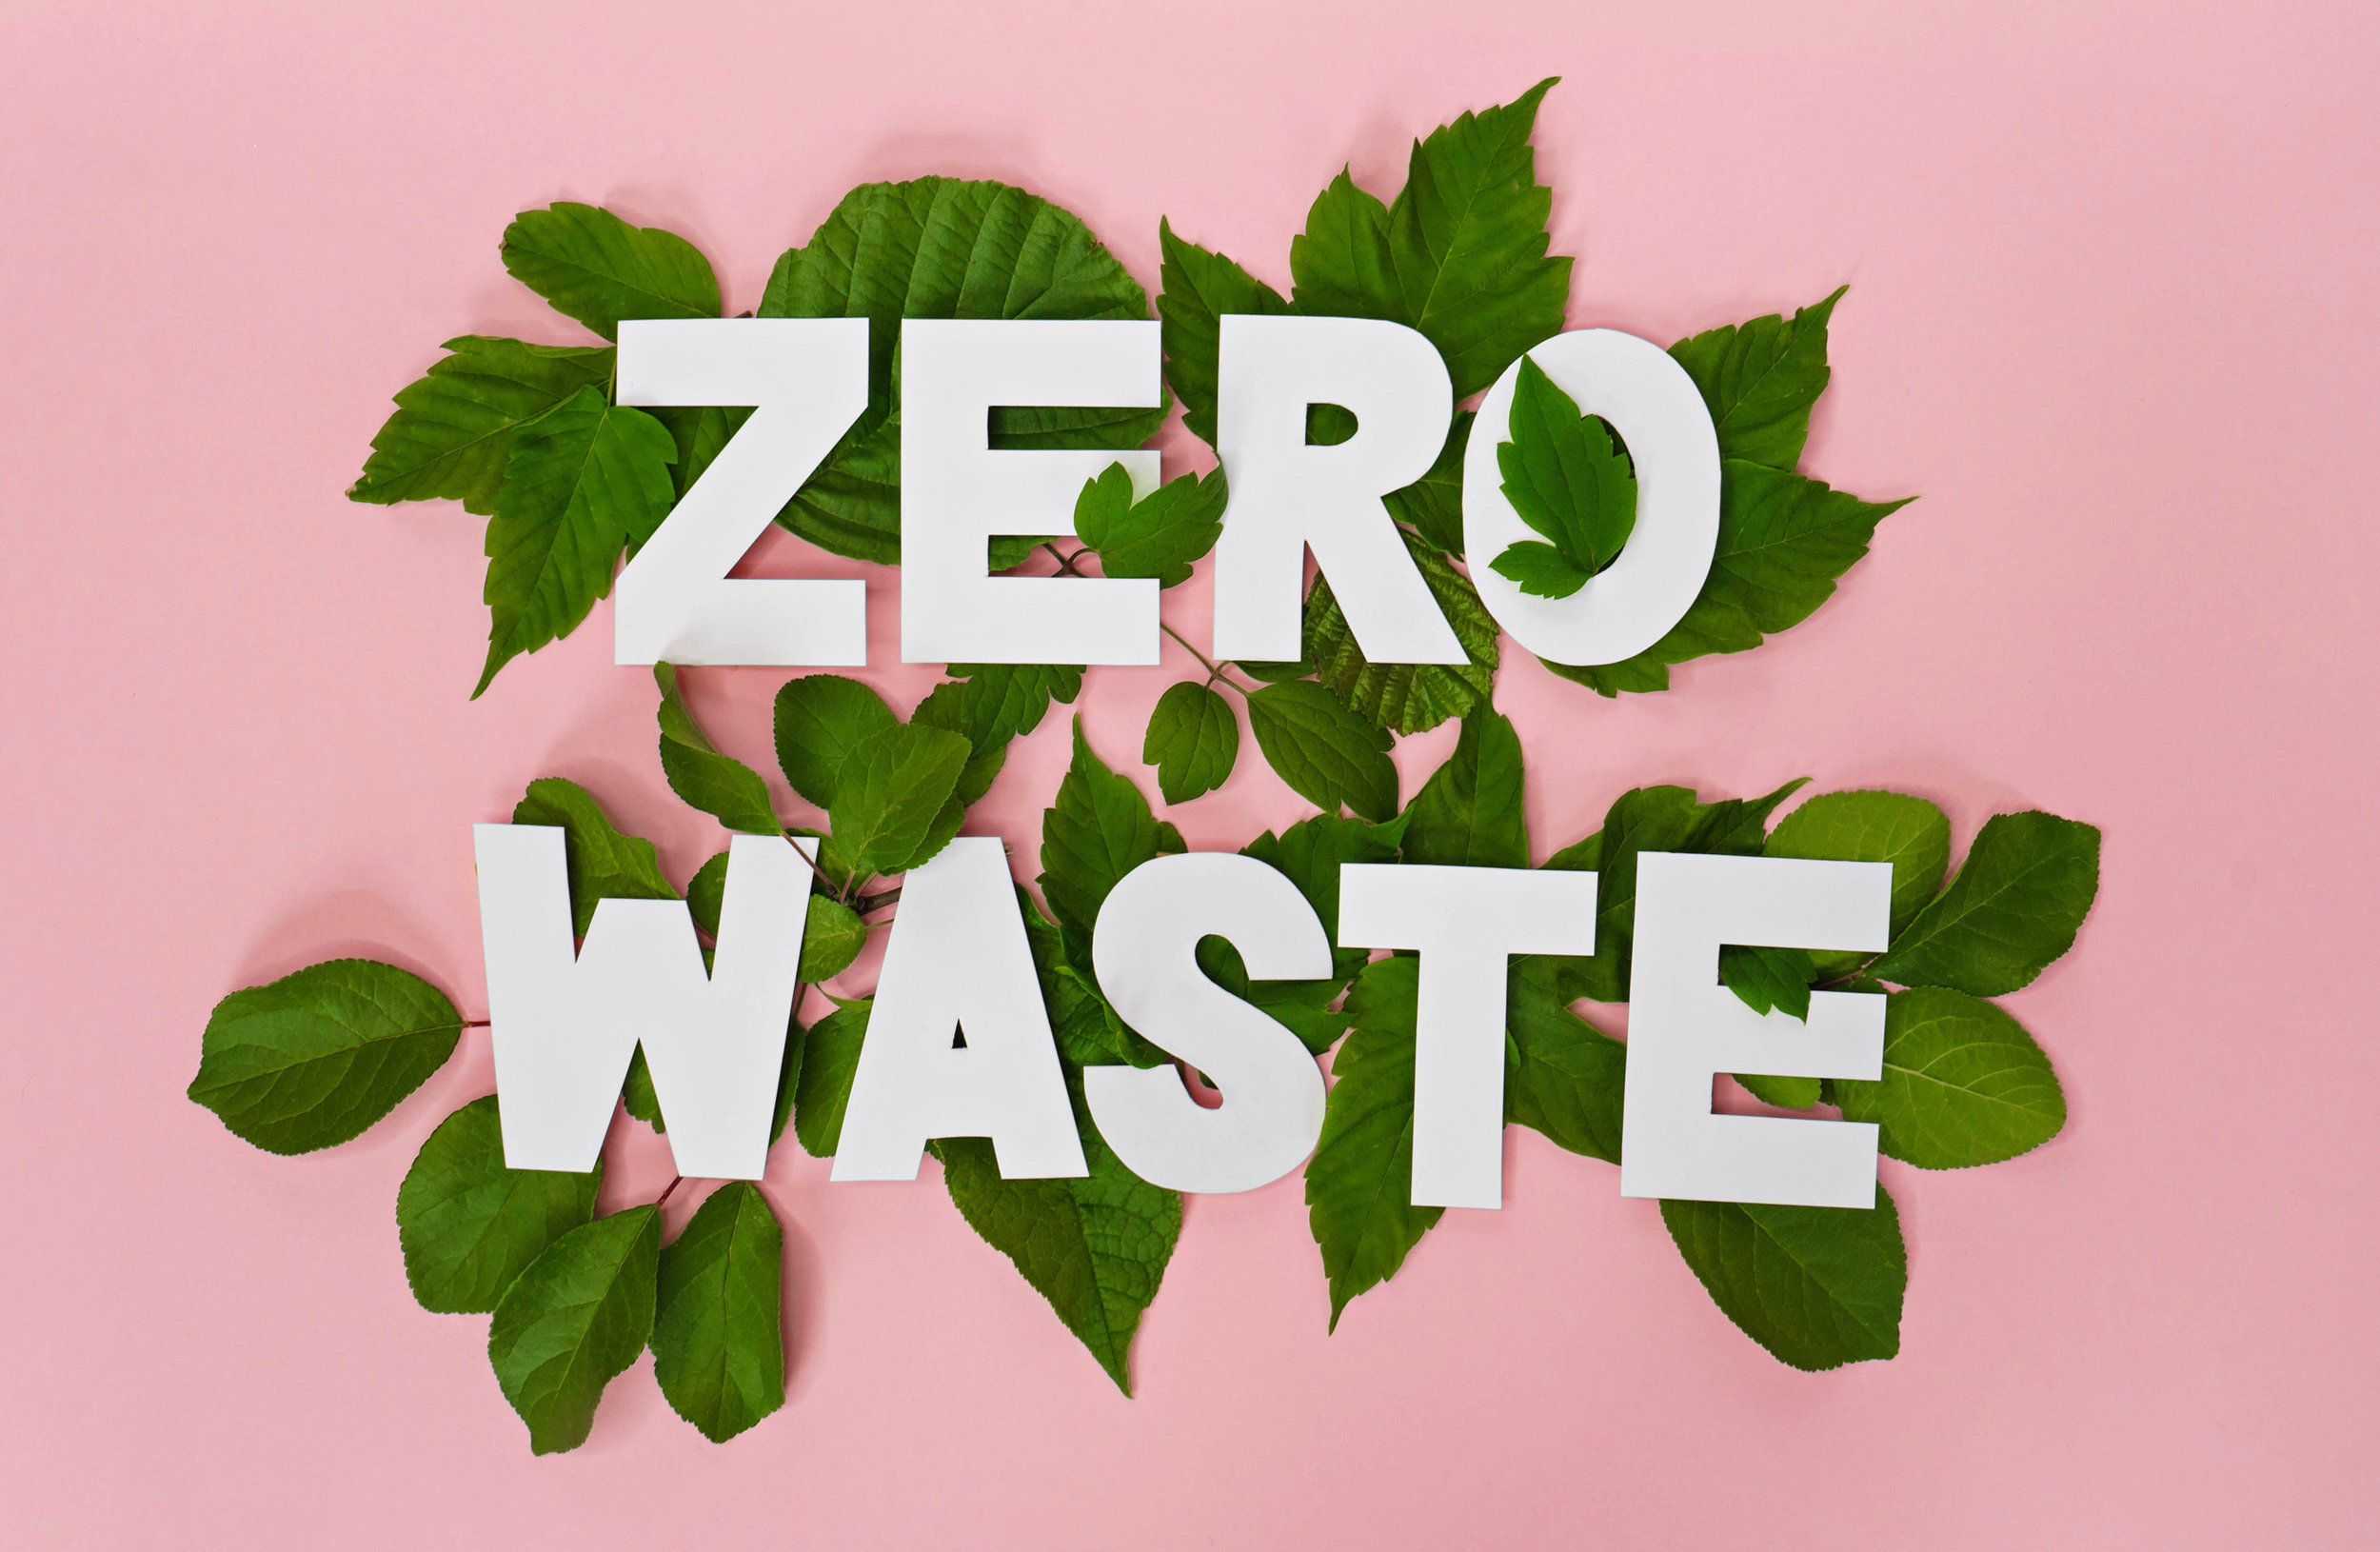 shutterstock_1123513106  - Zero Waste.jpg